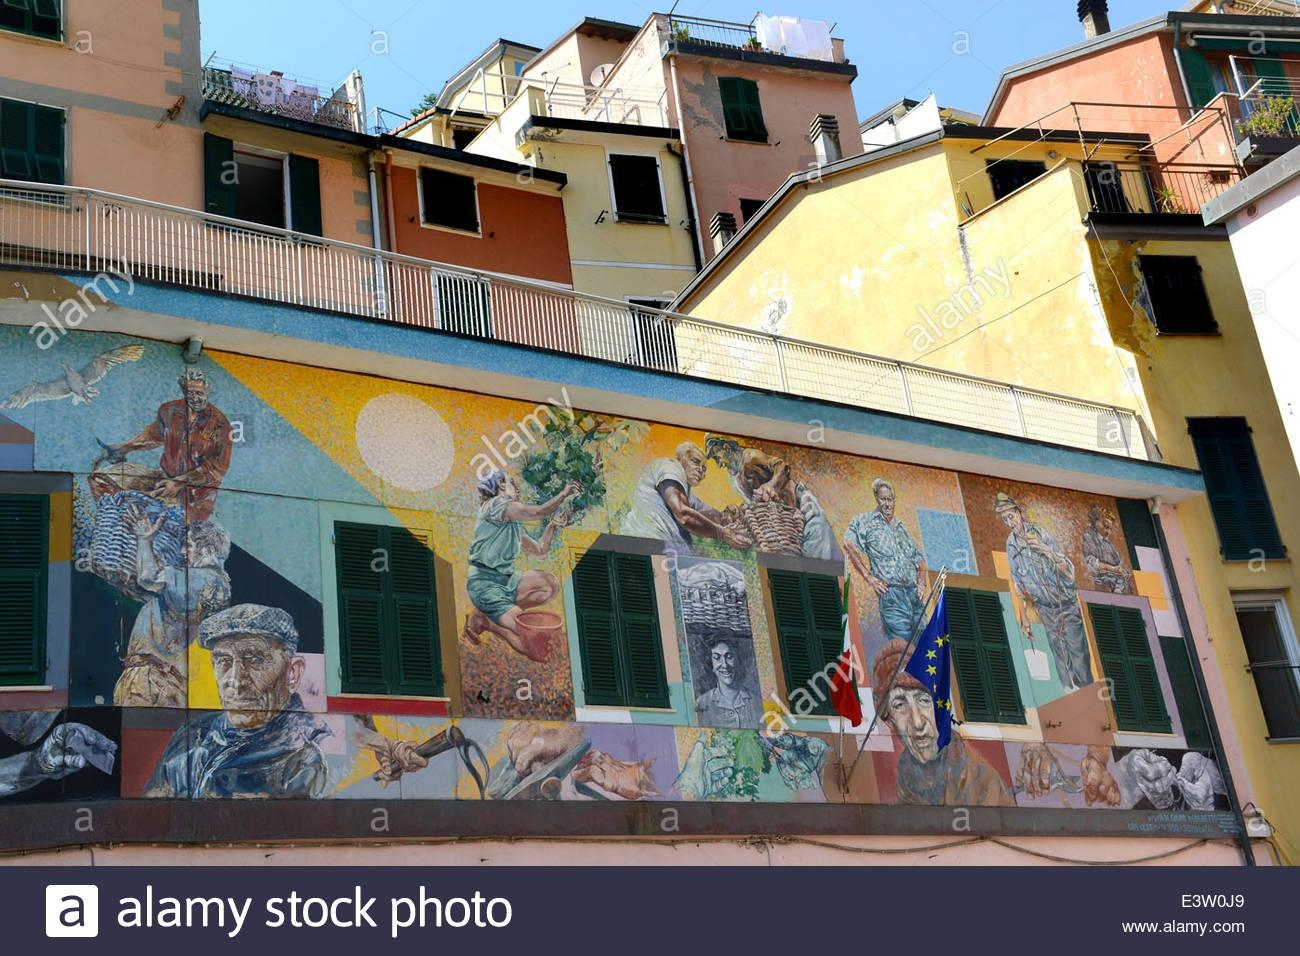 Italian Street Art Murals Mural At Riomaggiore On The Cinque Terre Inside Italian Art Wall Murals (View 6 of 20)